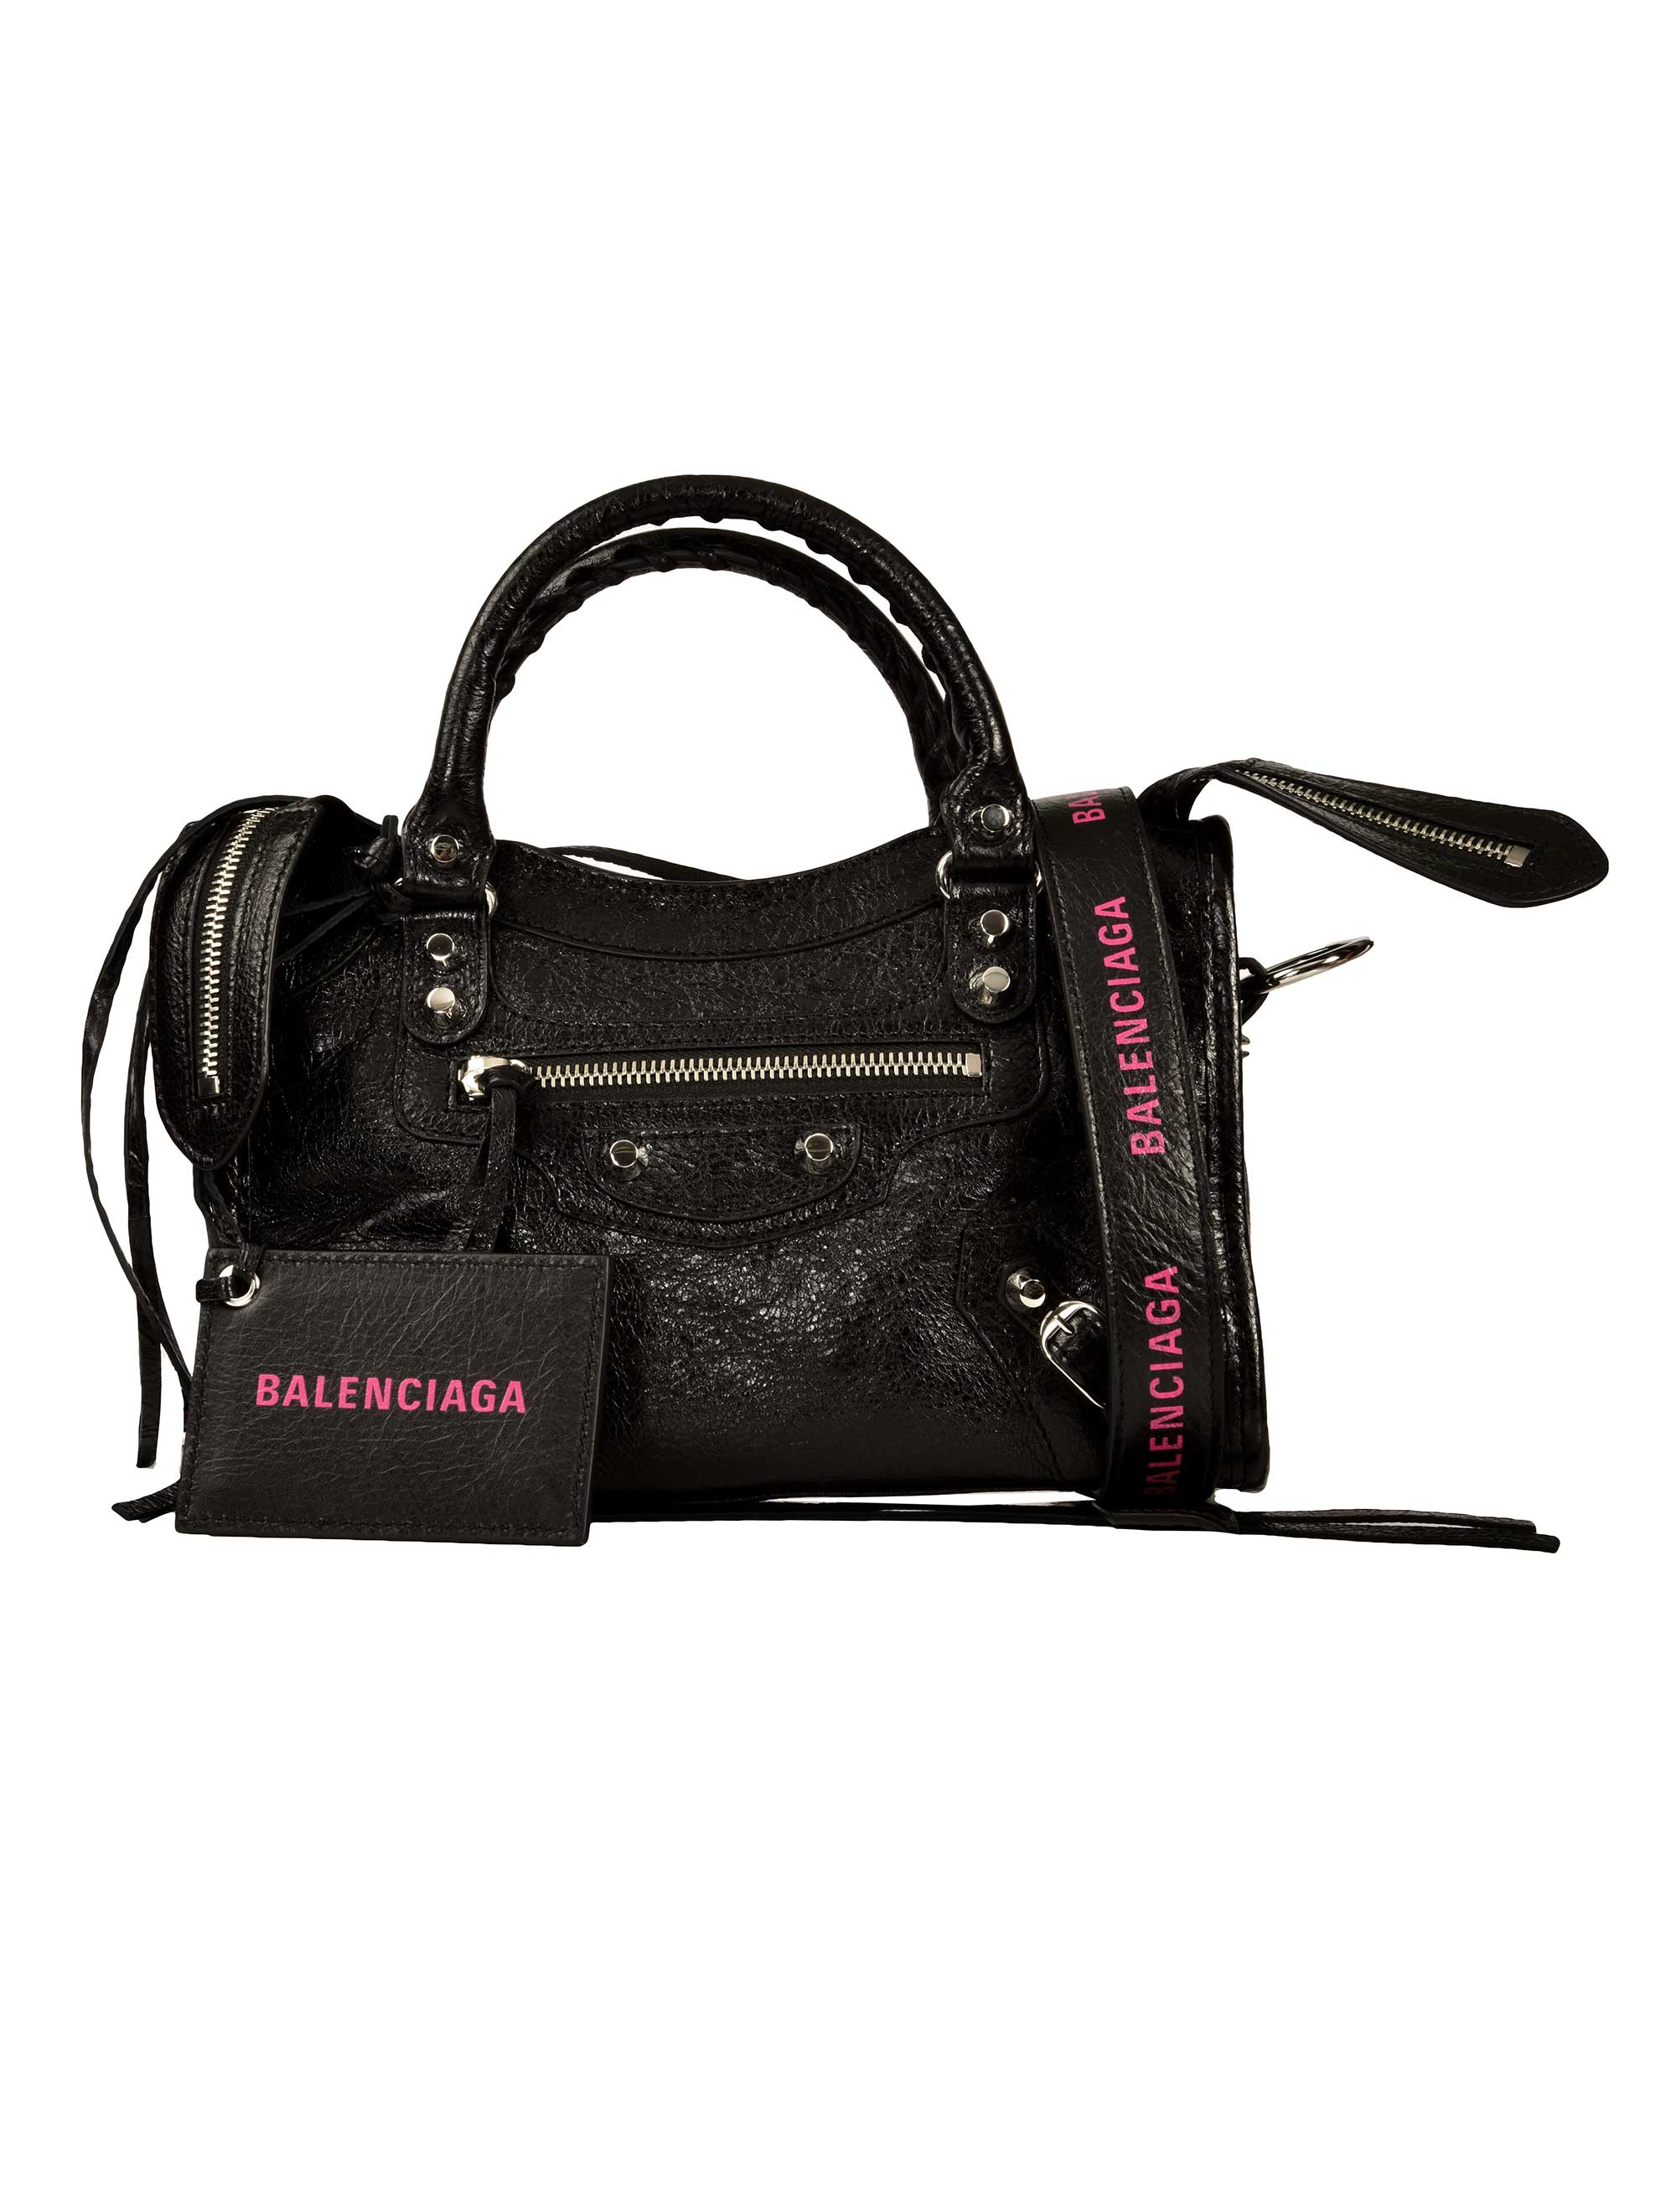 24bf20879316 Mimma Ninni – Luxury and Fashion Shopping. Balenciaga Classic Mini ...